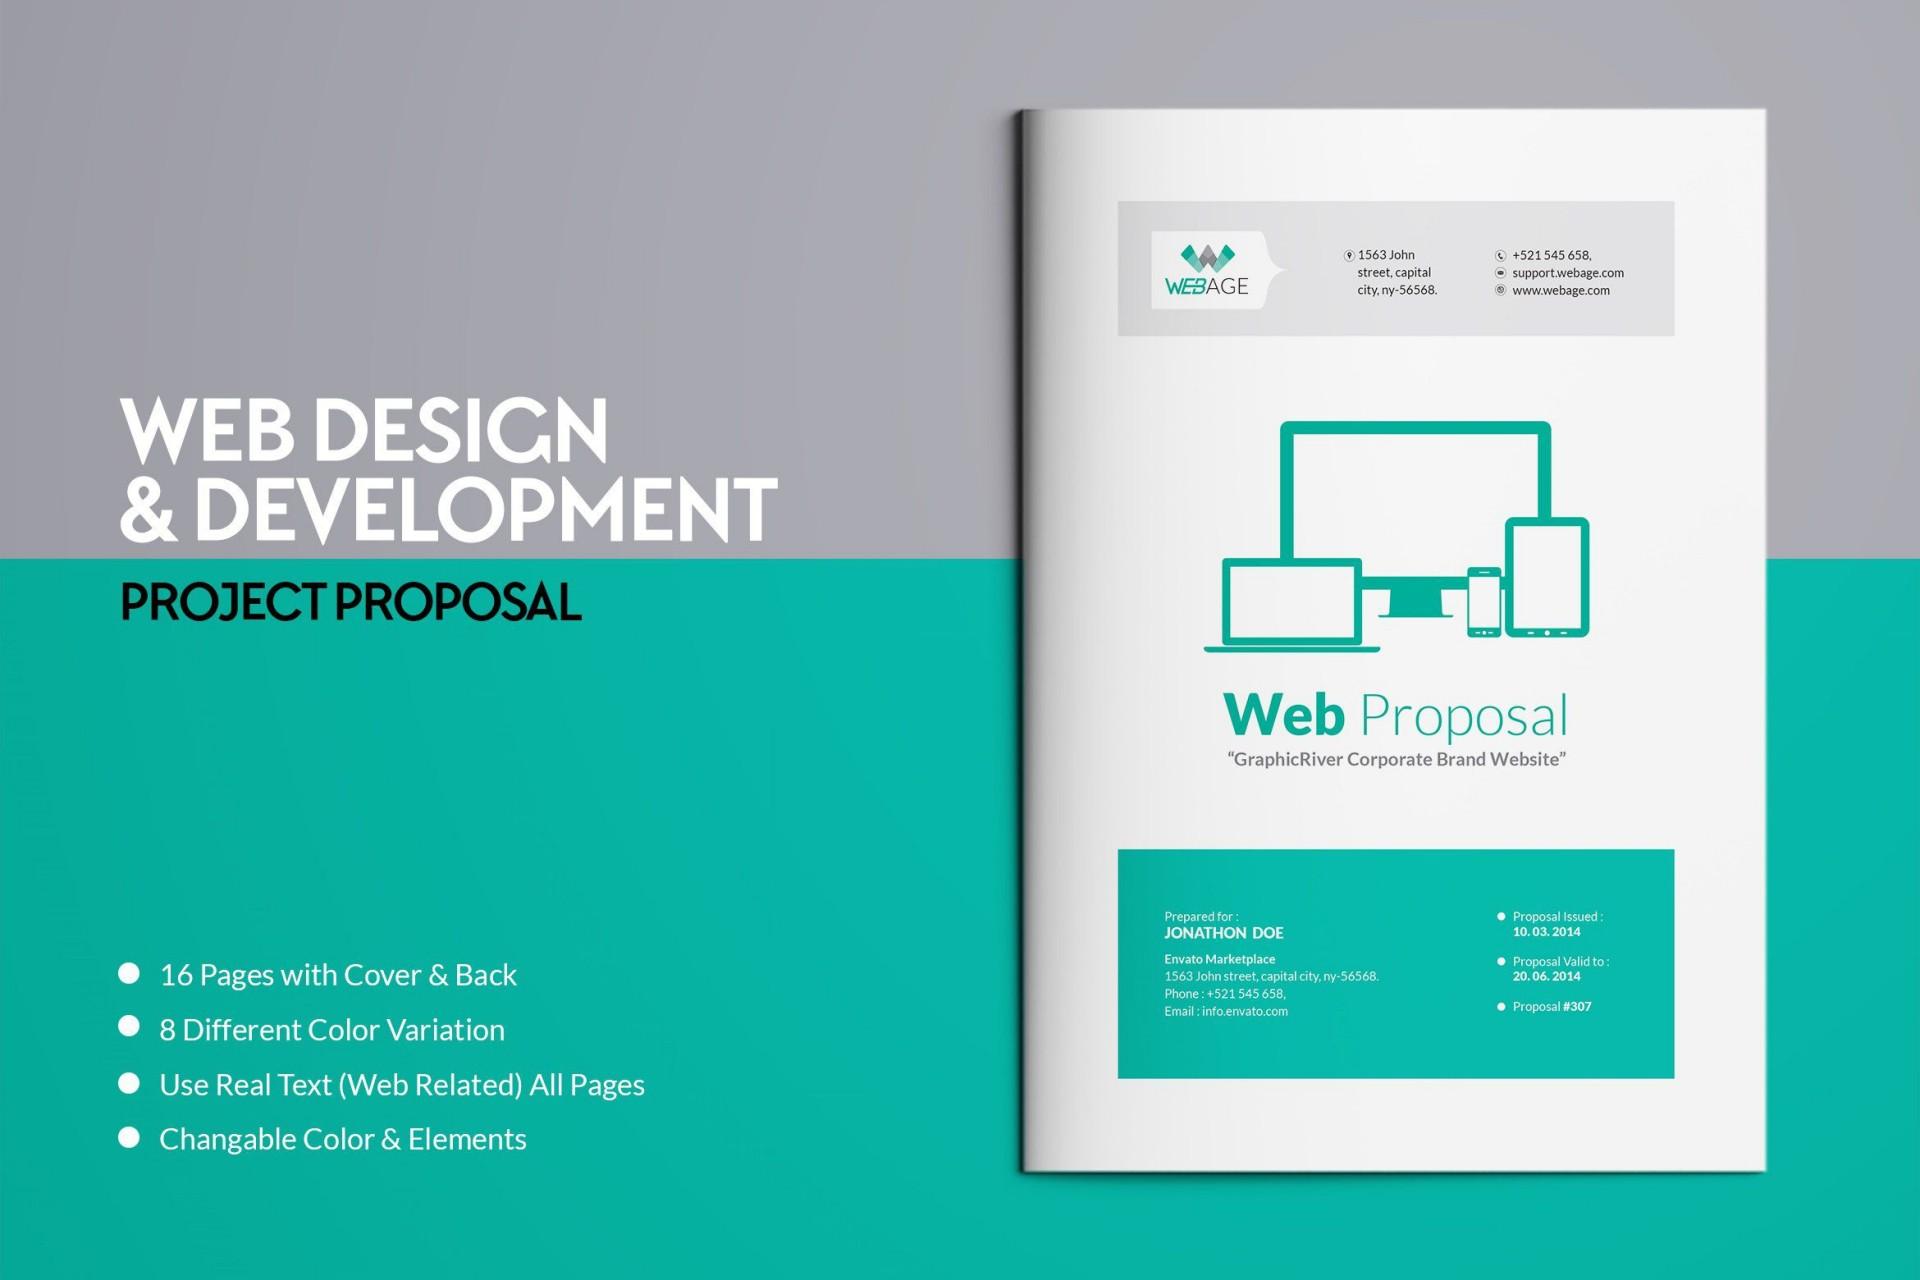 000 Imposing Web Design Proposal Template Indesign High Def 1920